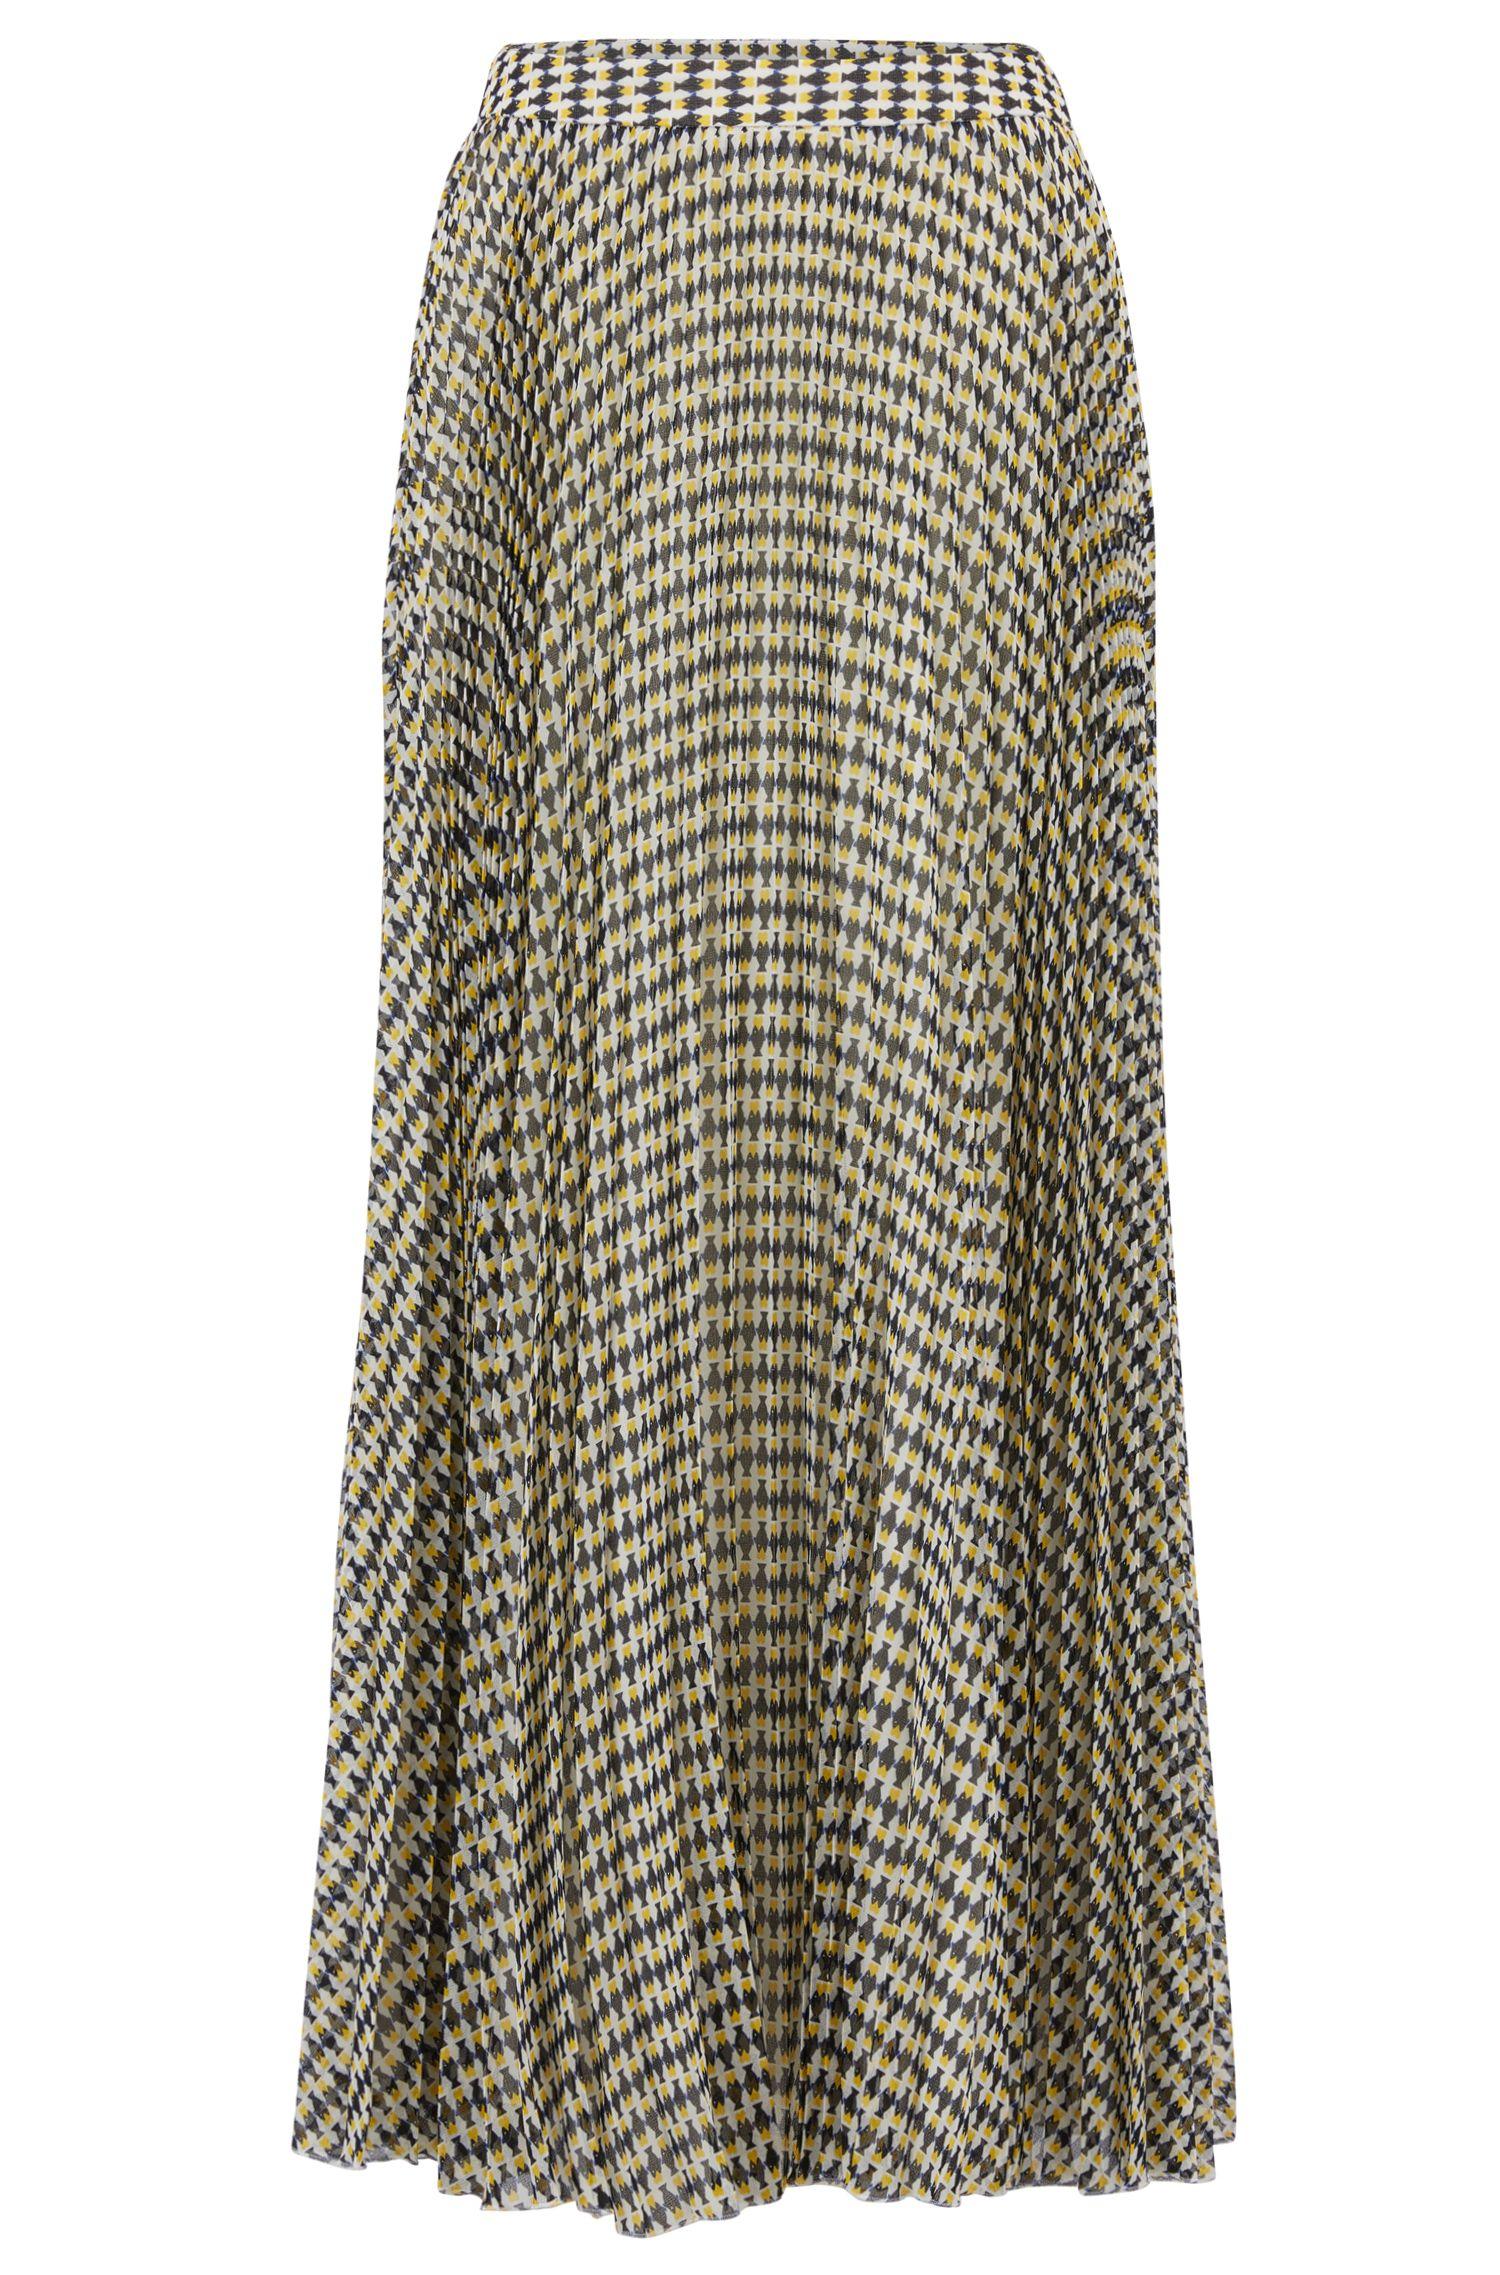 A-line skirt in fish-print chiffon plissé